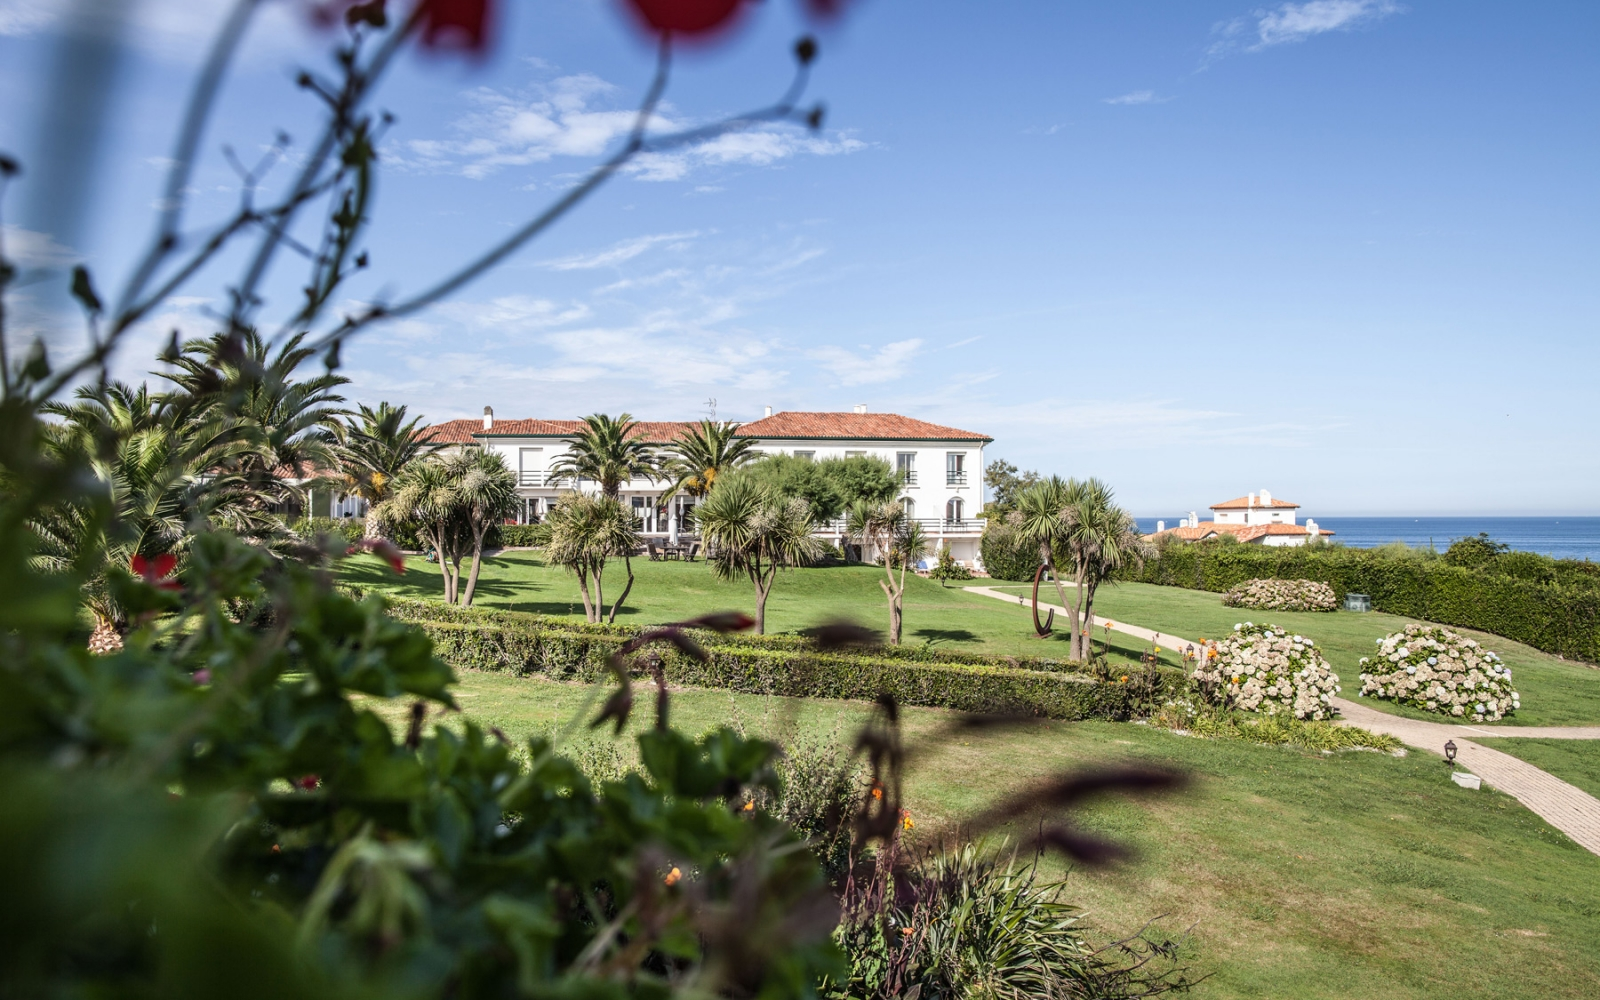 hotel-lareserve-saintjeandeluz-panorama-1600x1000